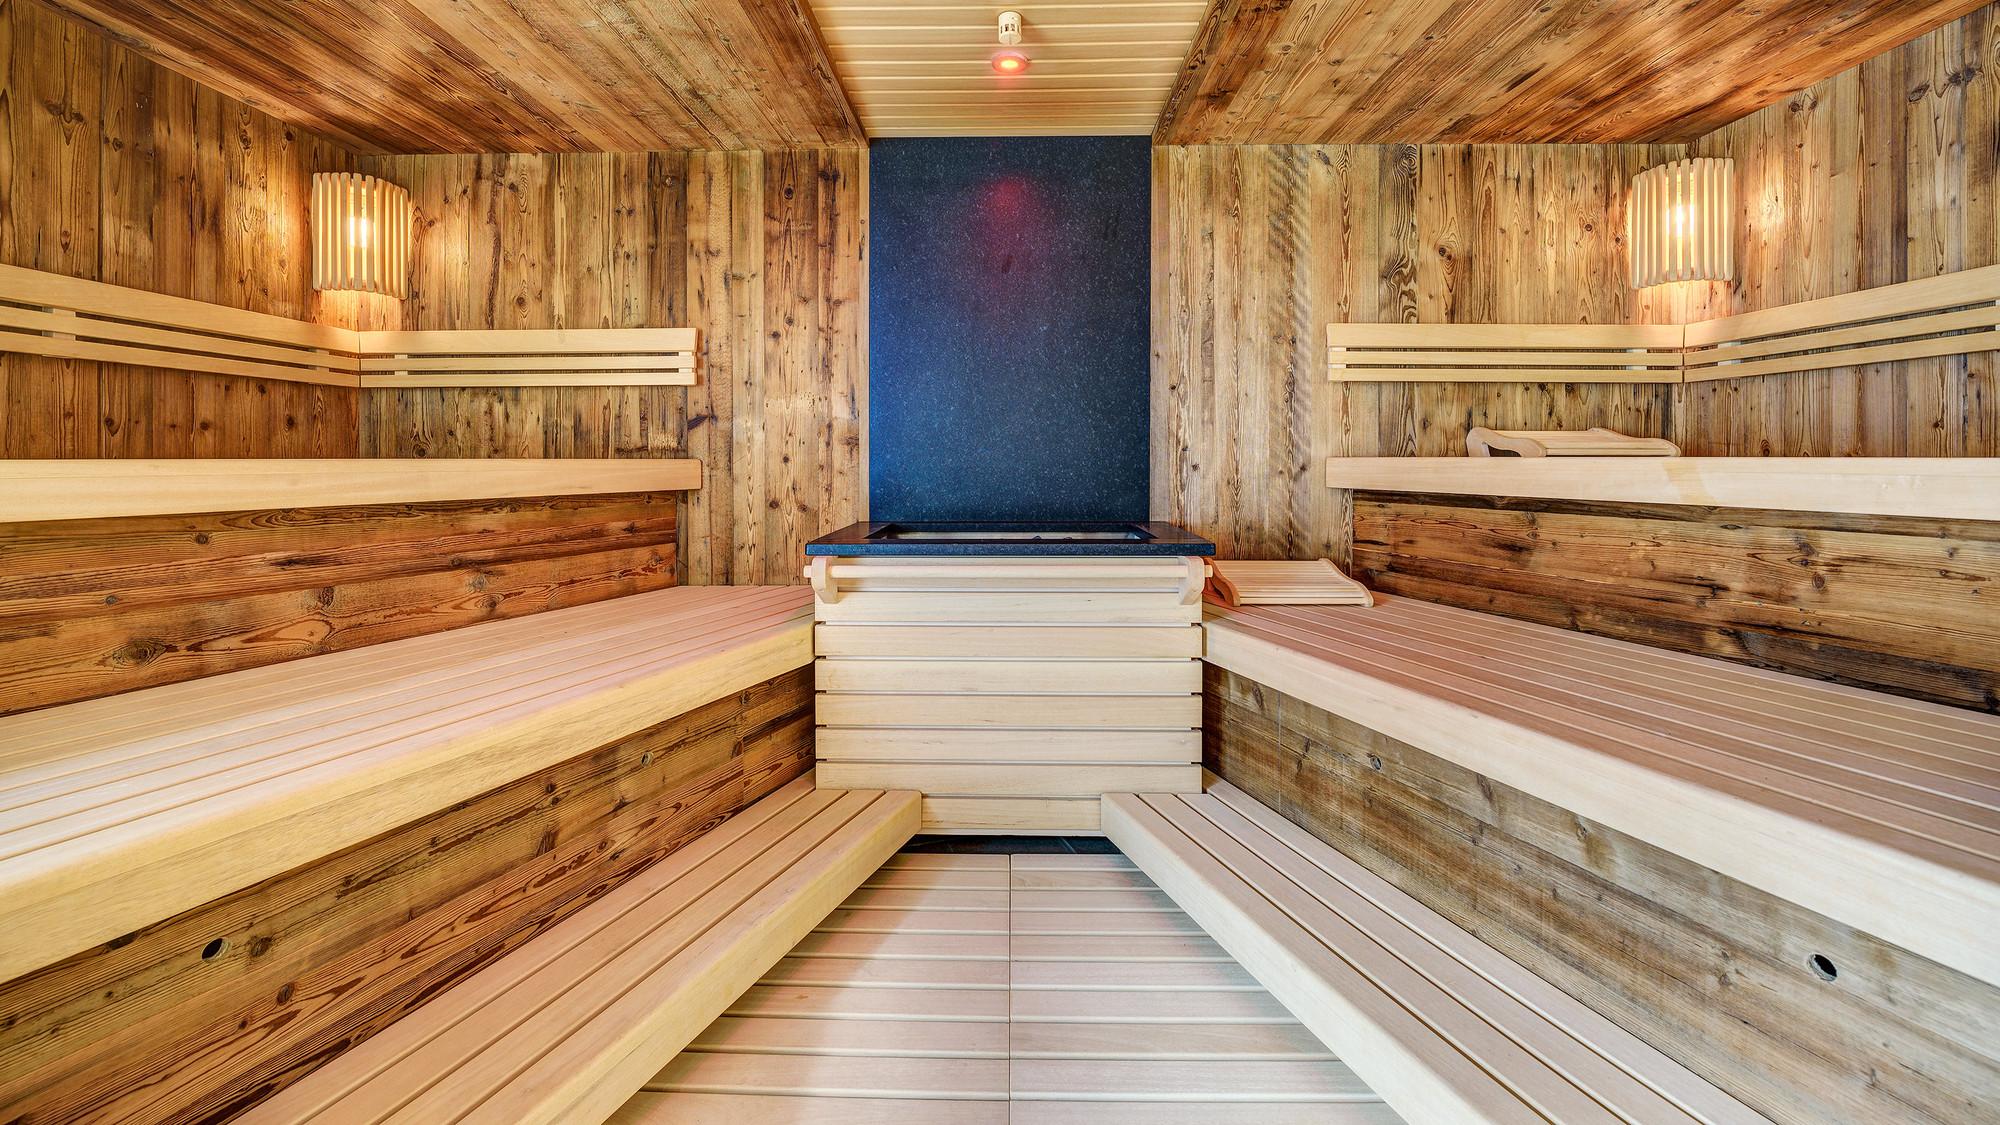 saunawelt wellness relax hotel saltauserhof hotel. Black Bedroom Furniture Sets. Home Design Ideas